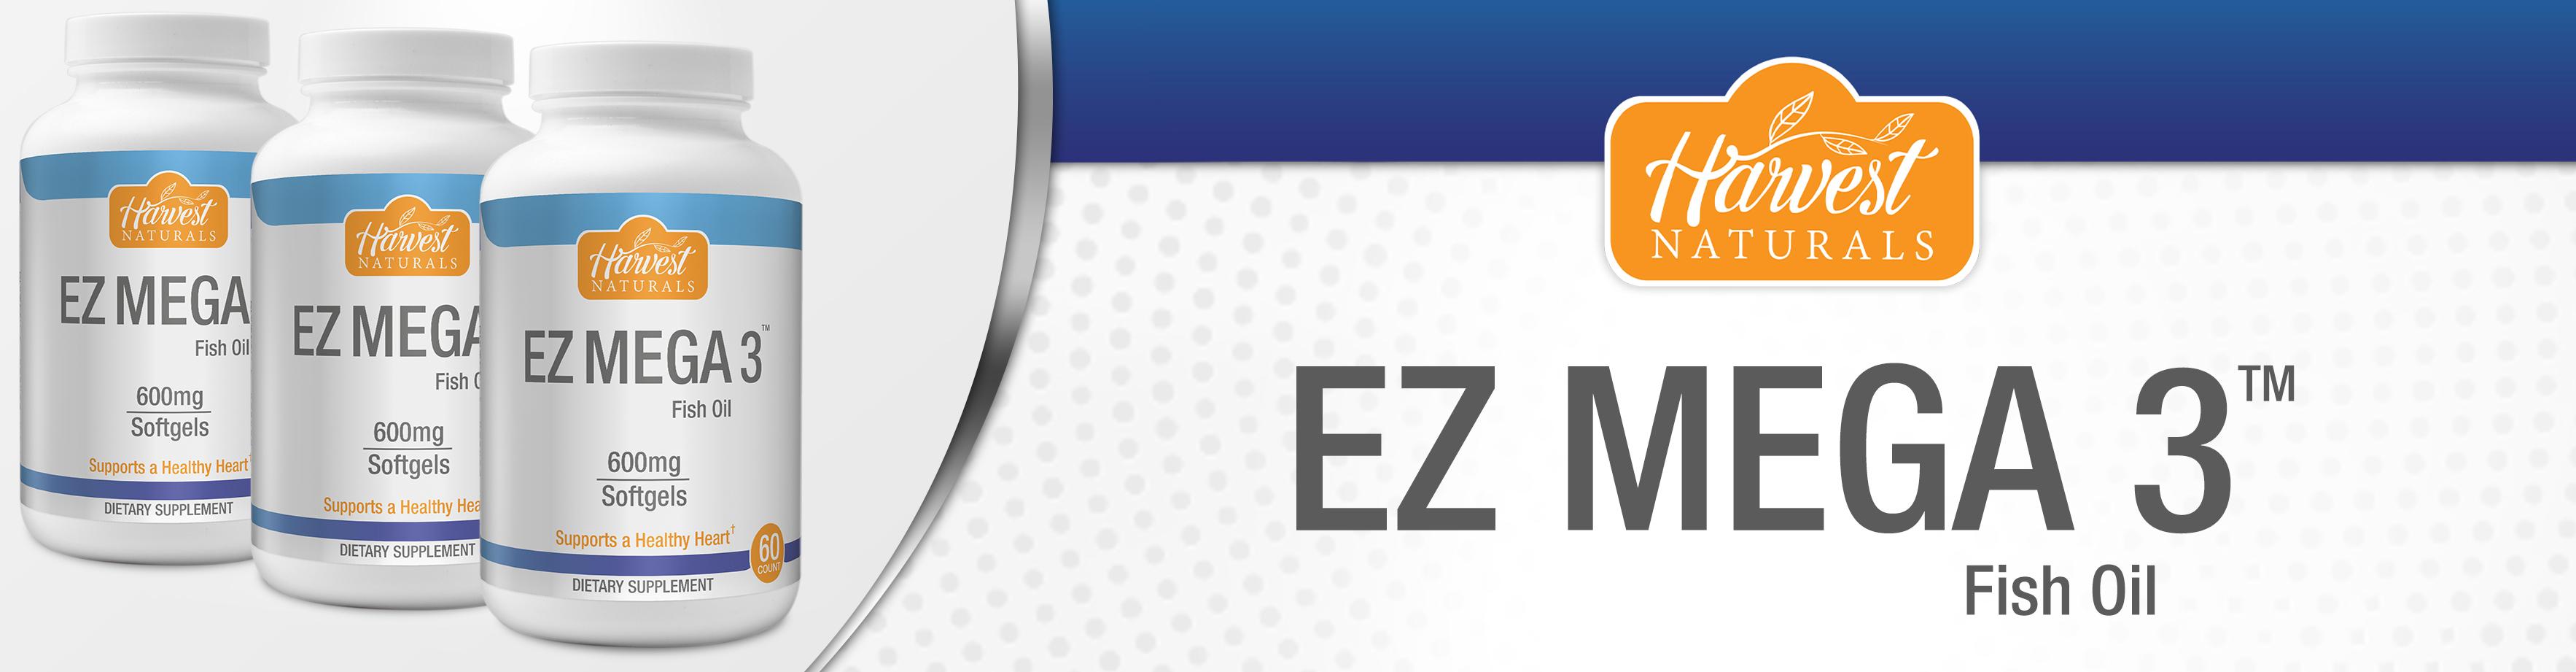 ez-mega-3-fish-oil.jpg